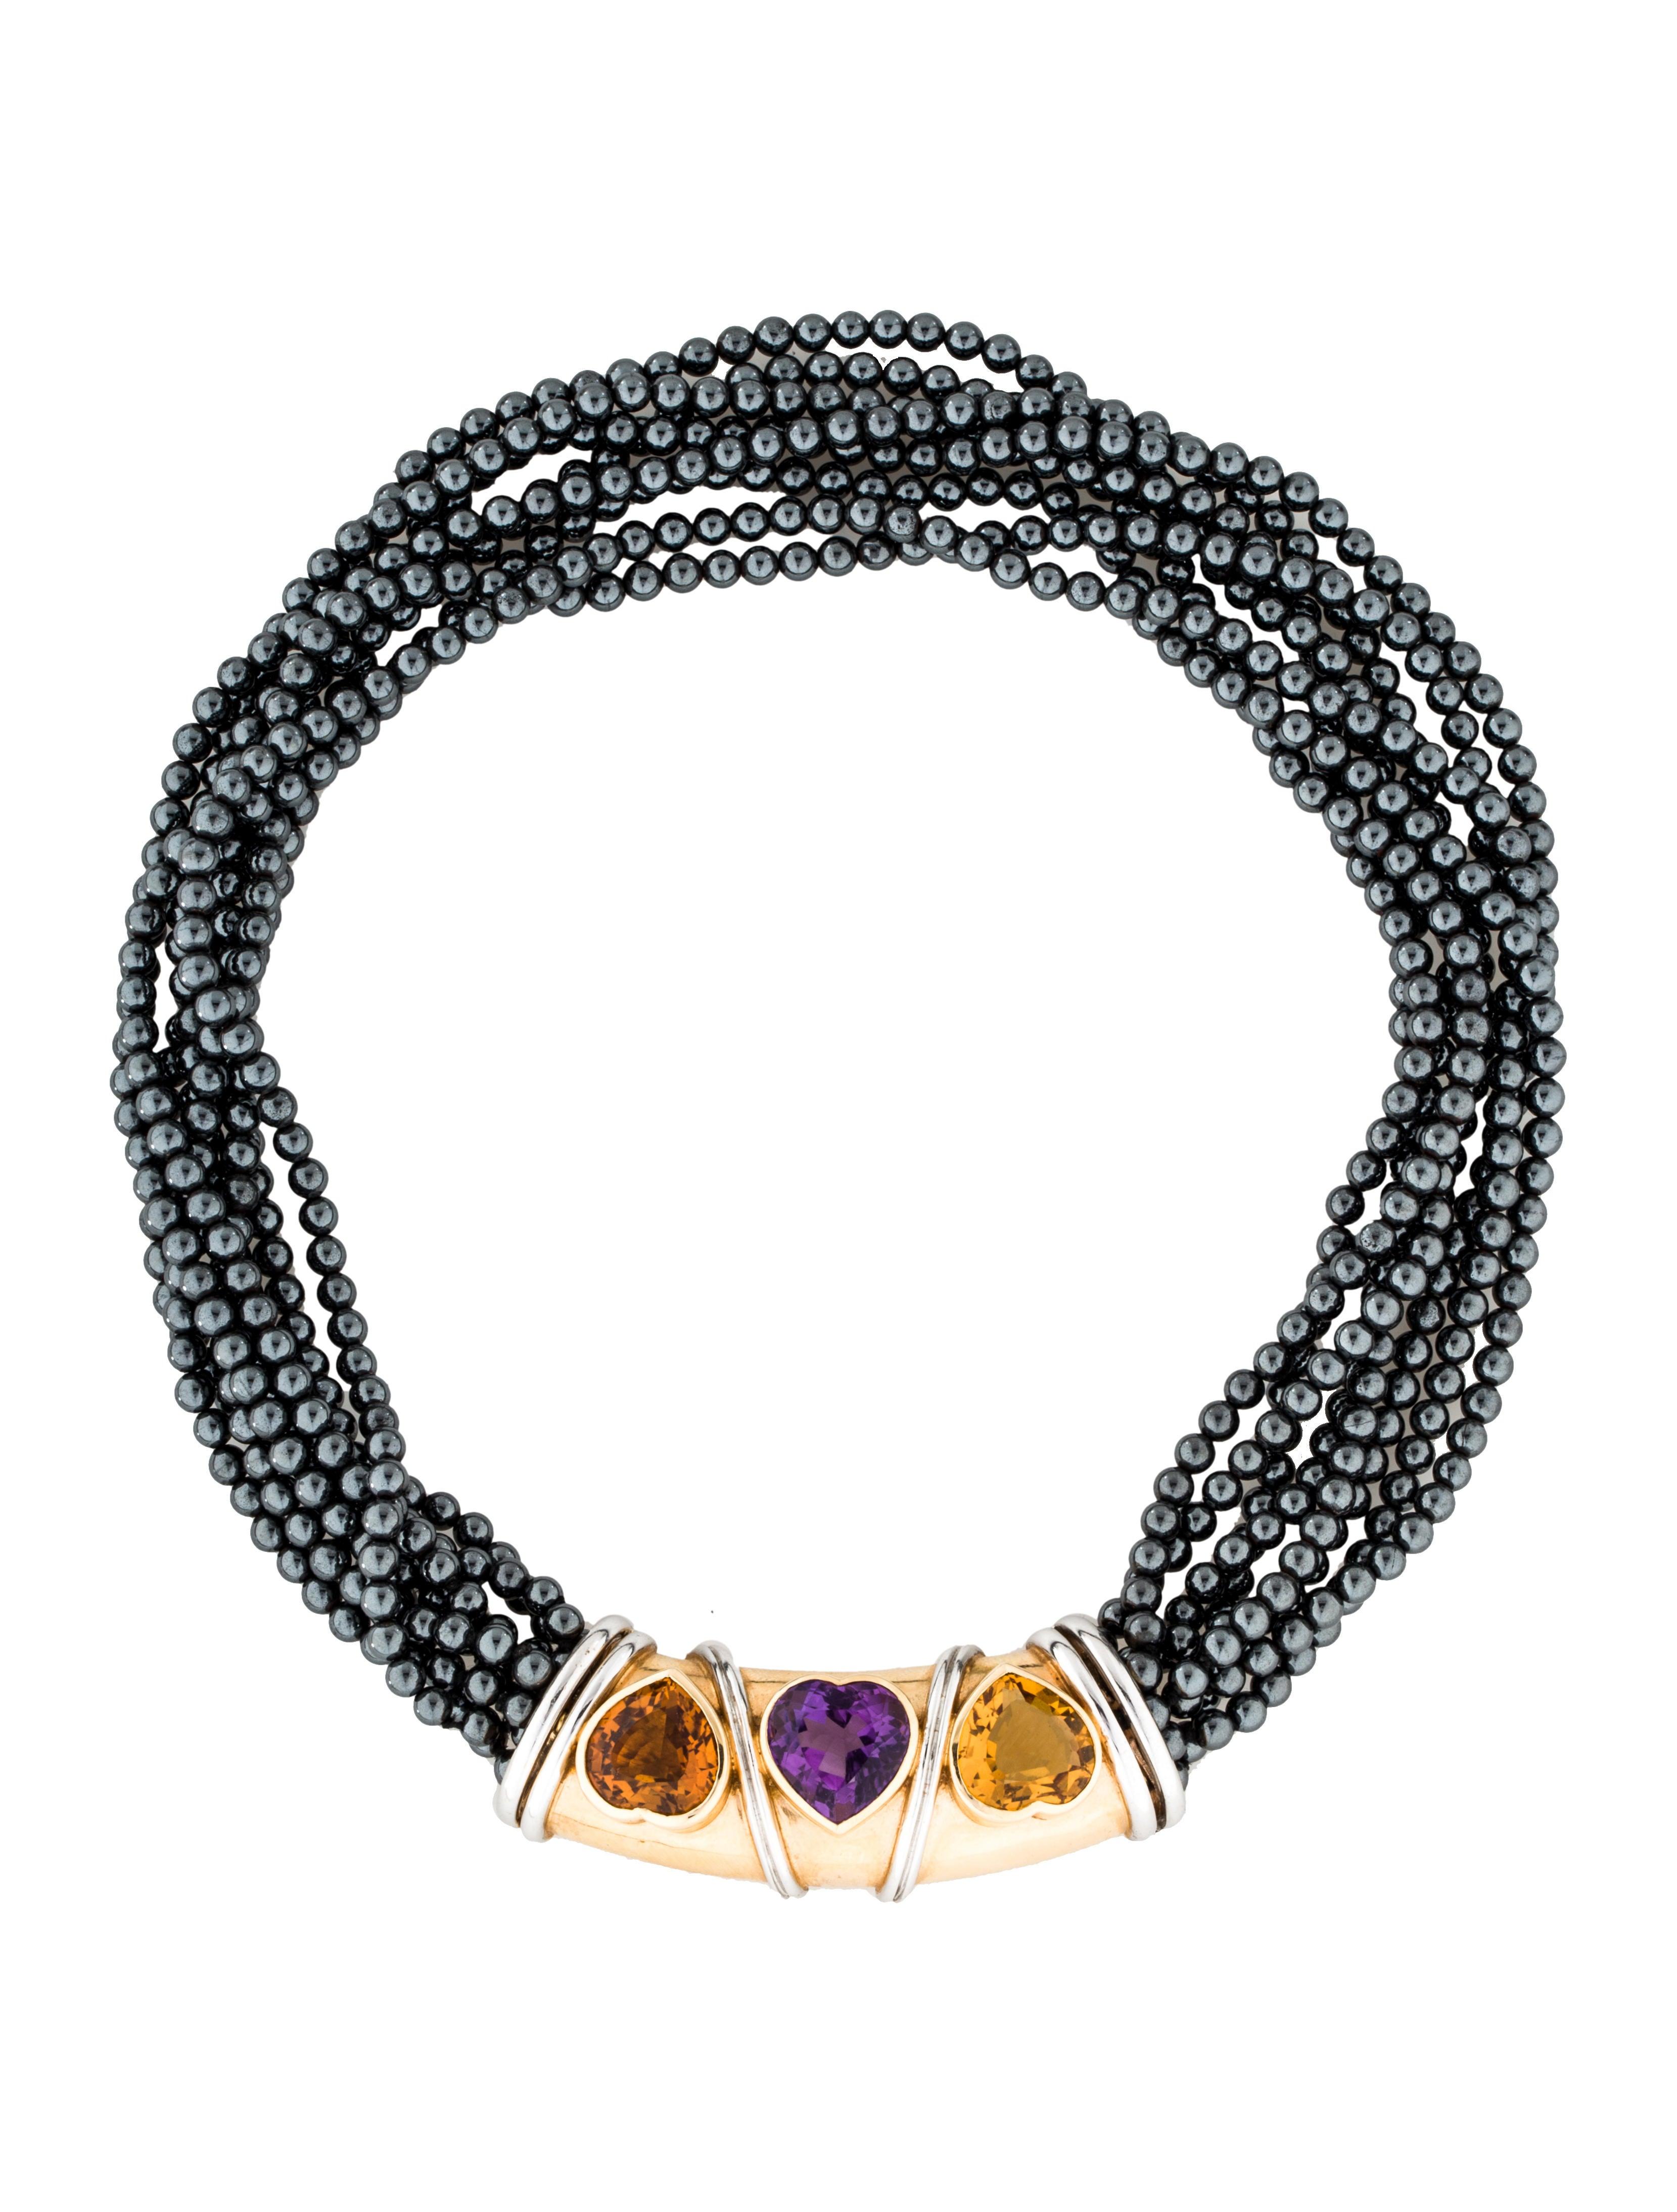 14k heart shaped citrine amp amethyst bead necklace